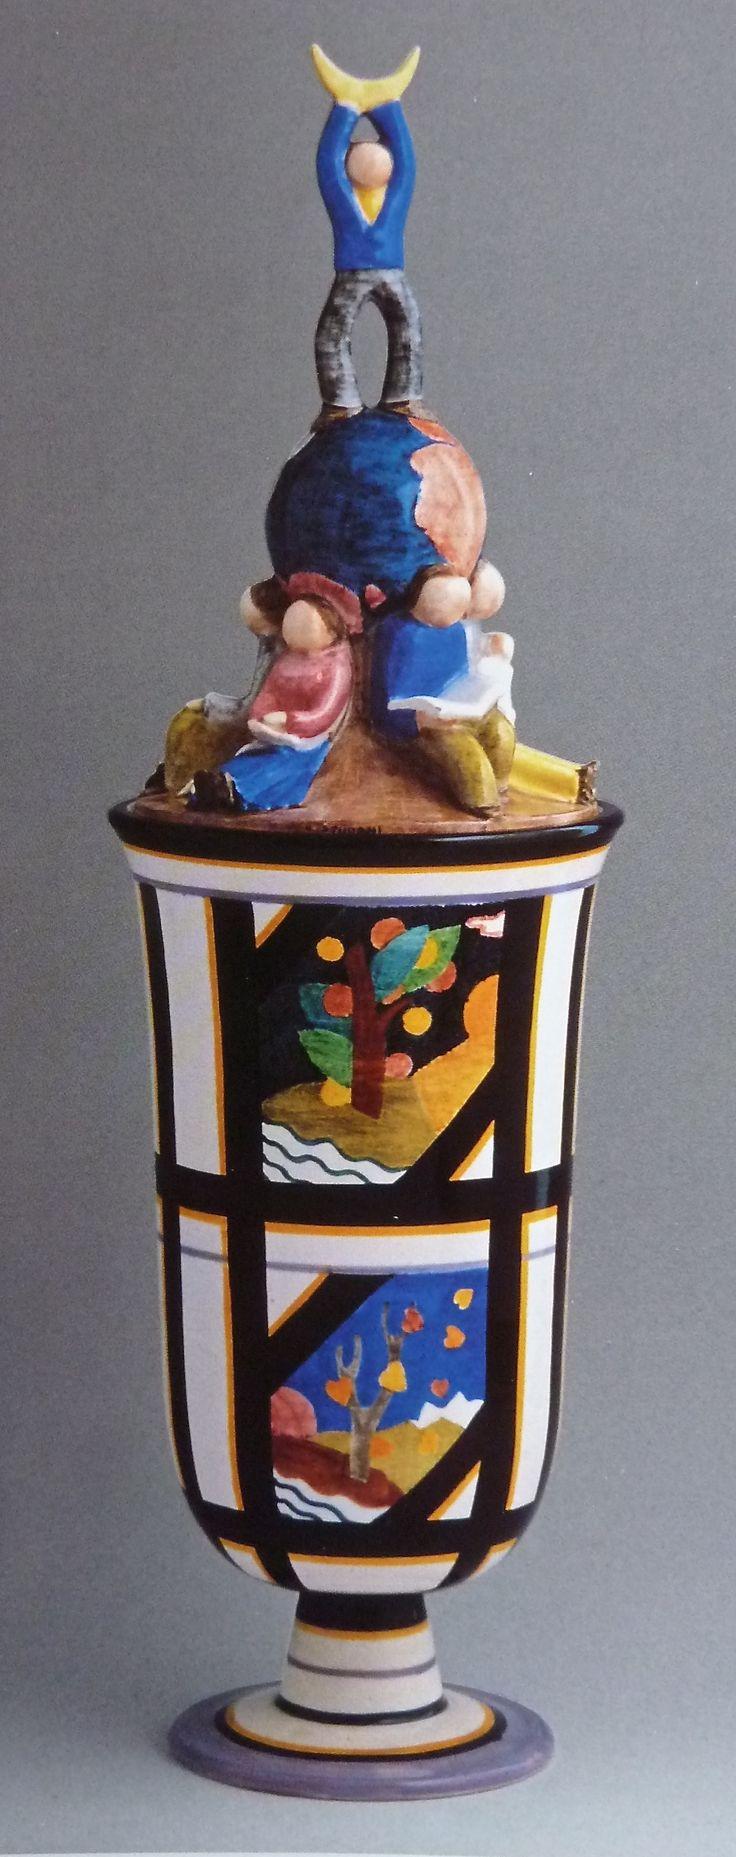 'The World and the Moon', vase by Mario Sturani, 1930 Lenci, Turin, Italy.